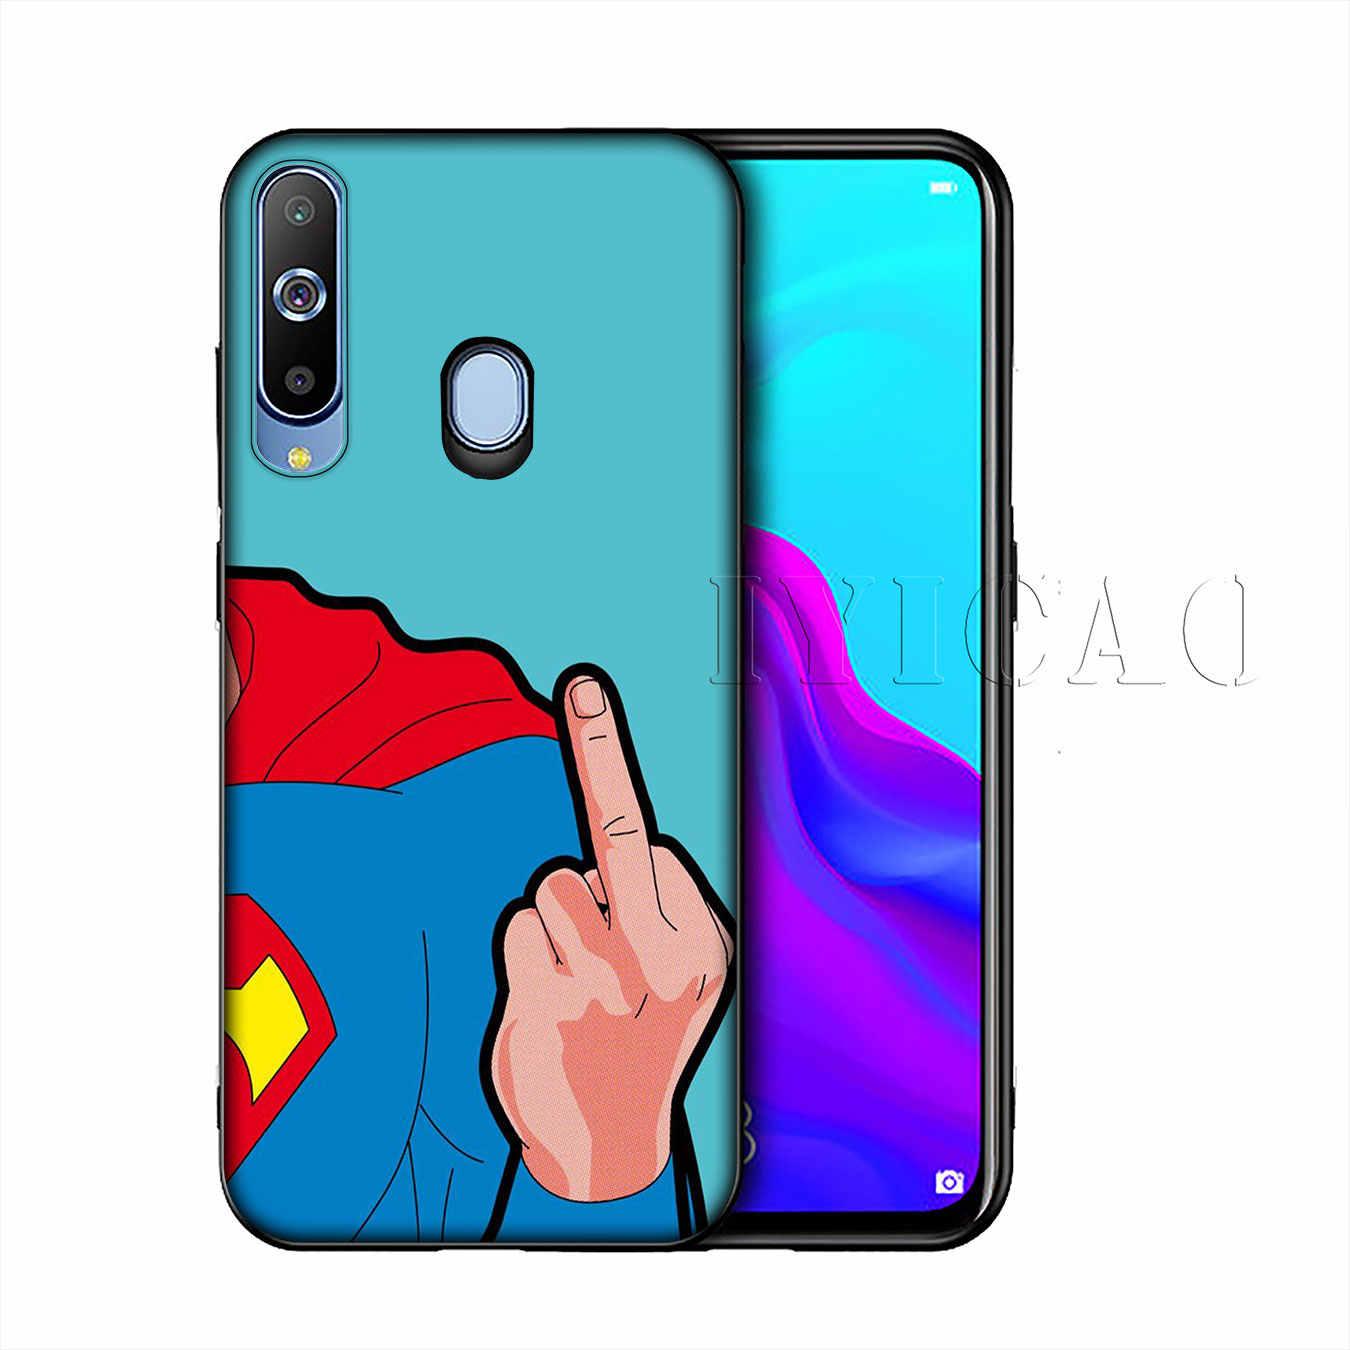 Pop kunst Coque Shell Weiche Silikon Abdeckung für Samsung Galaxy Note 10 Plus A50s A40s A30s A20s A10s Fall